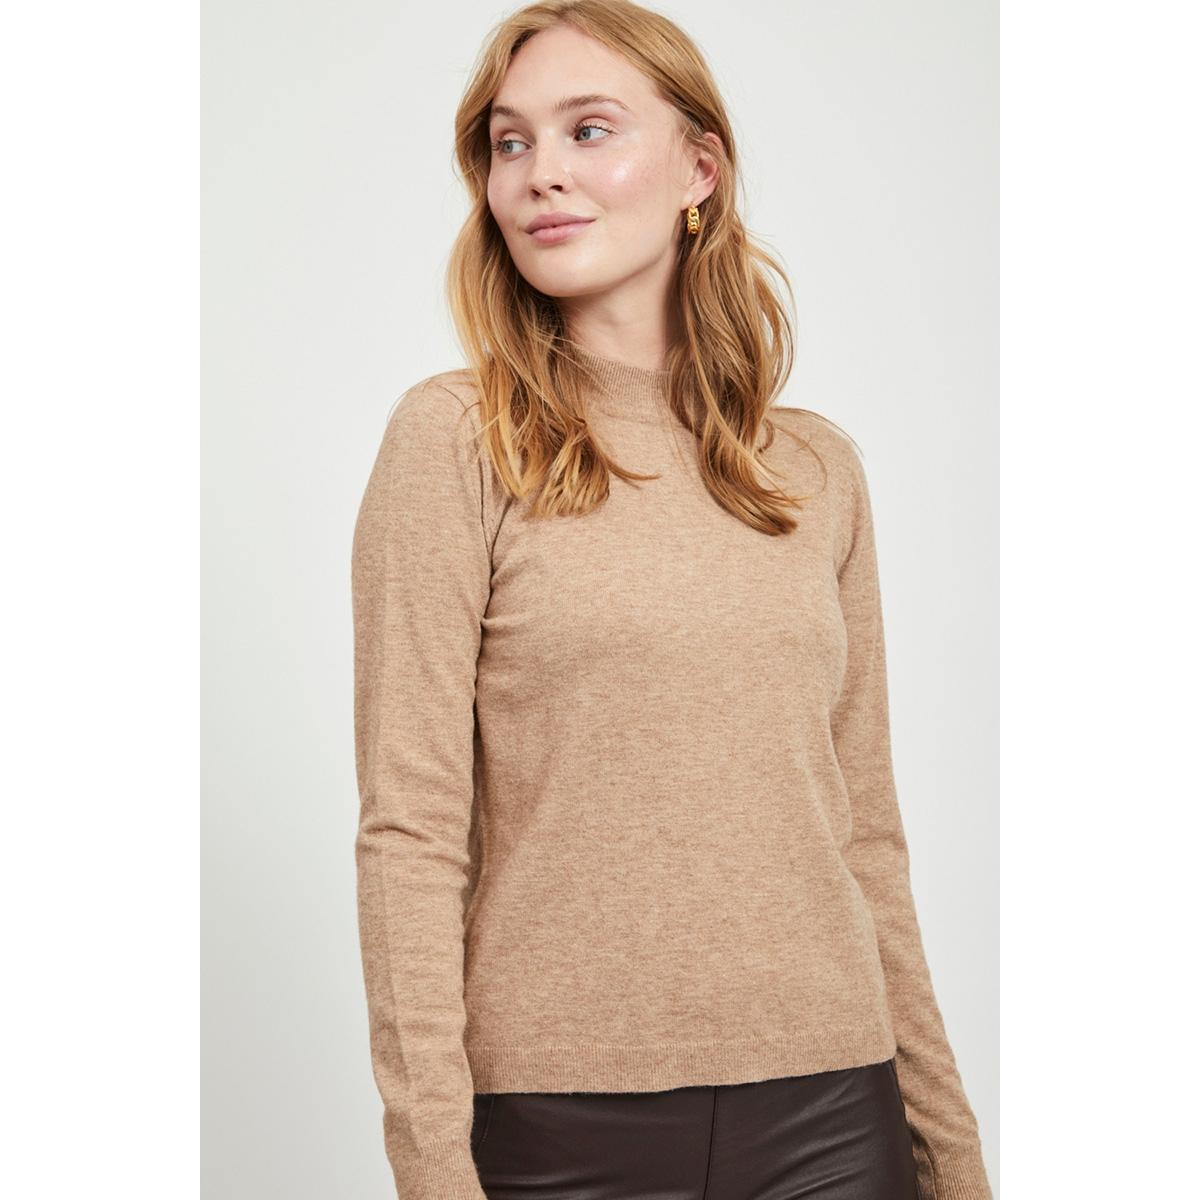 objthess l/s knit pullover noos 23030144 object trui chipmunk/melange